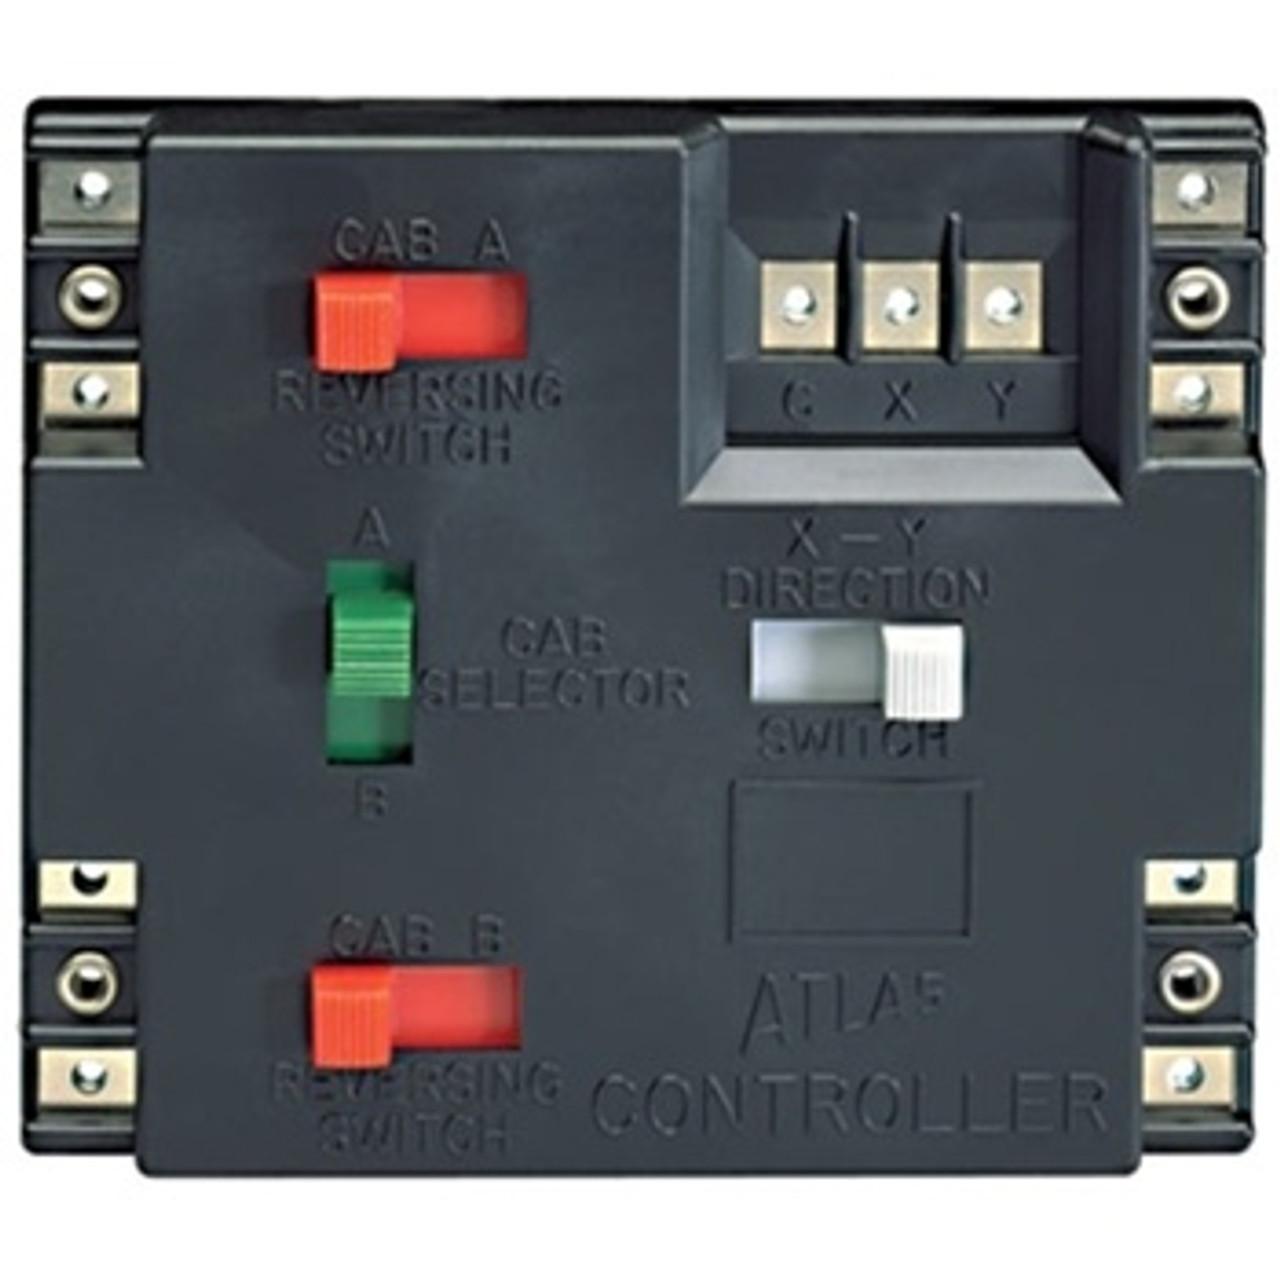 small resolution of model train atlas 220 controller modeltrainstuff atlas model train switch track wiring on wiring voltage selector